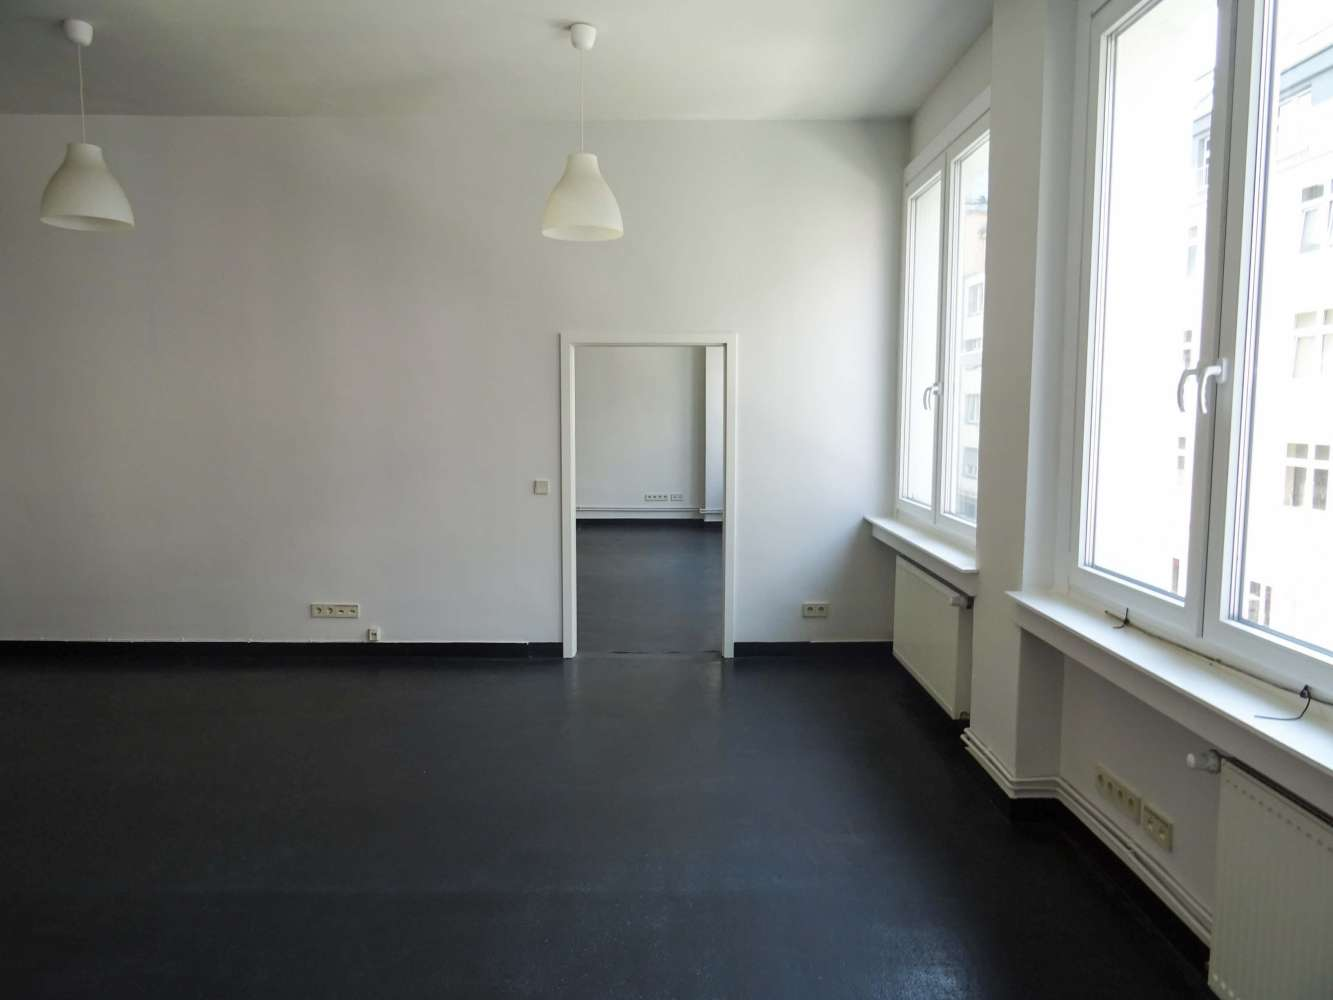 Büros Frankfurt am main, 60329 - Büro - Frankfurt am Main, Bahnhofsviertel - F2646 - 10375250